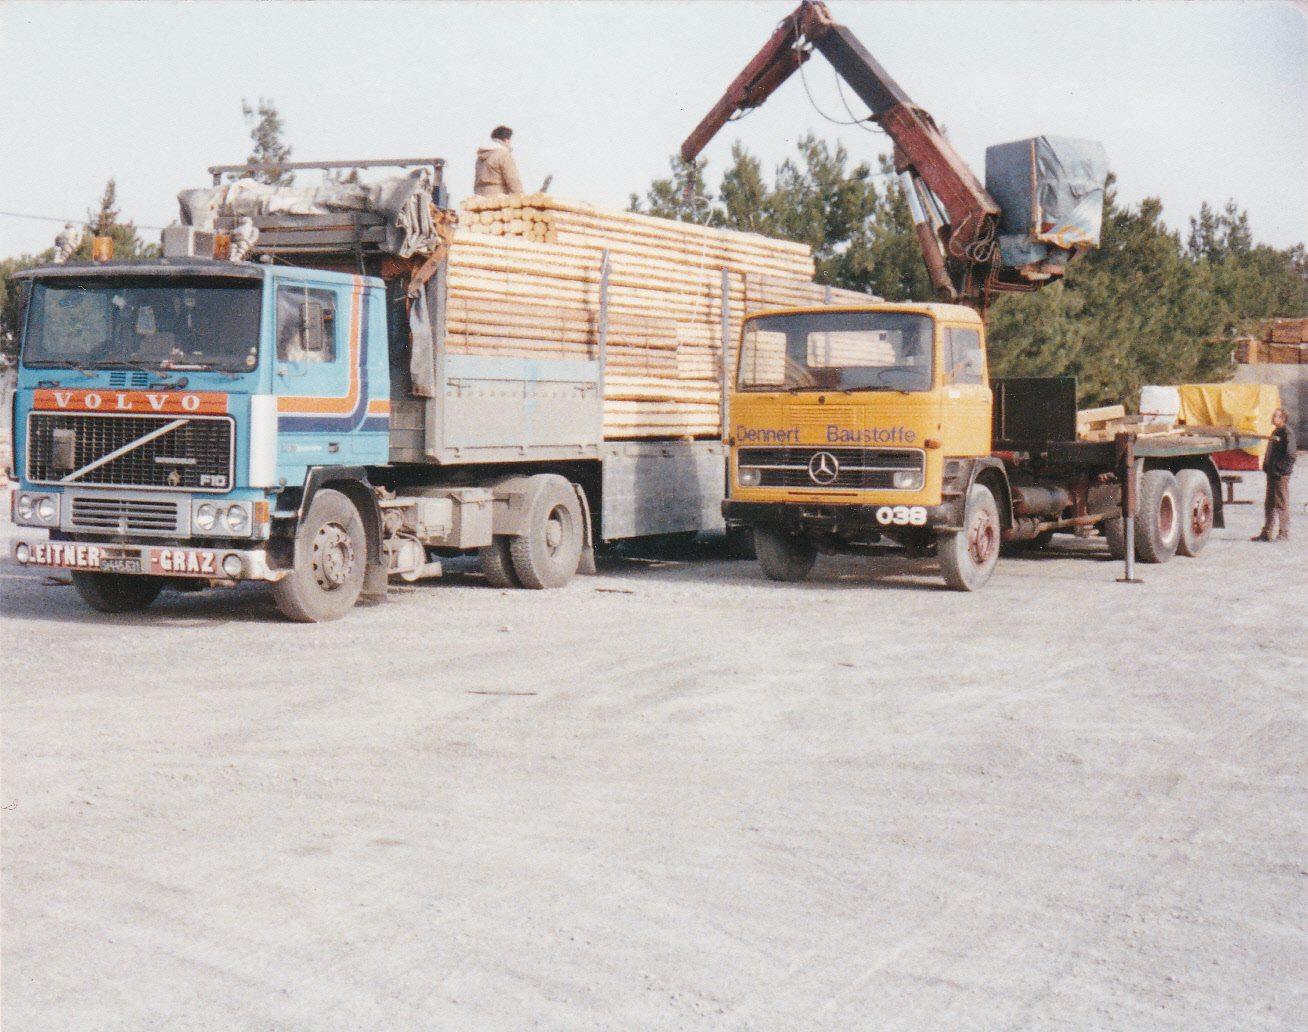 volvo--Anfang-der-90ger---Holz-nach-Griechenland